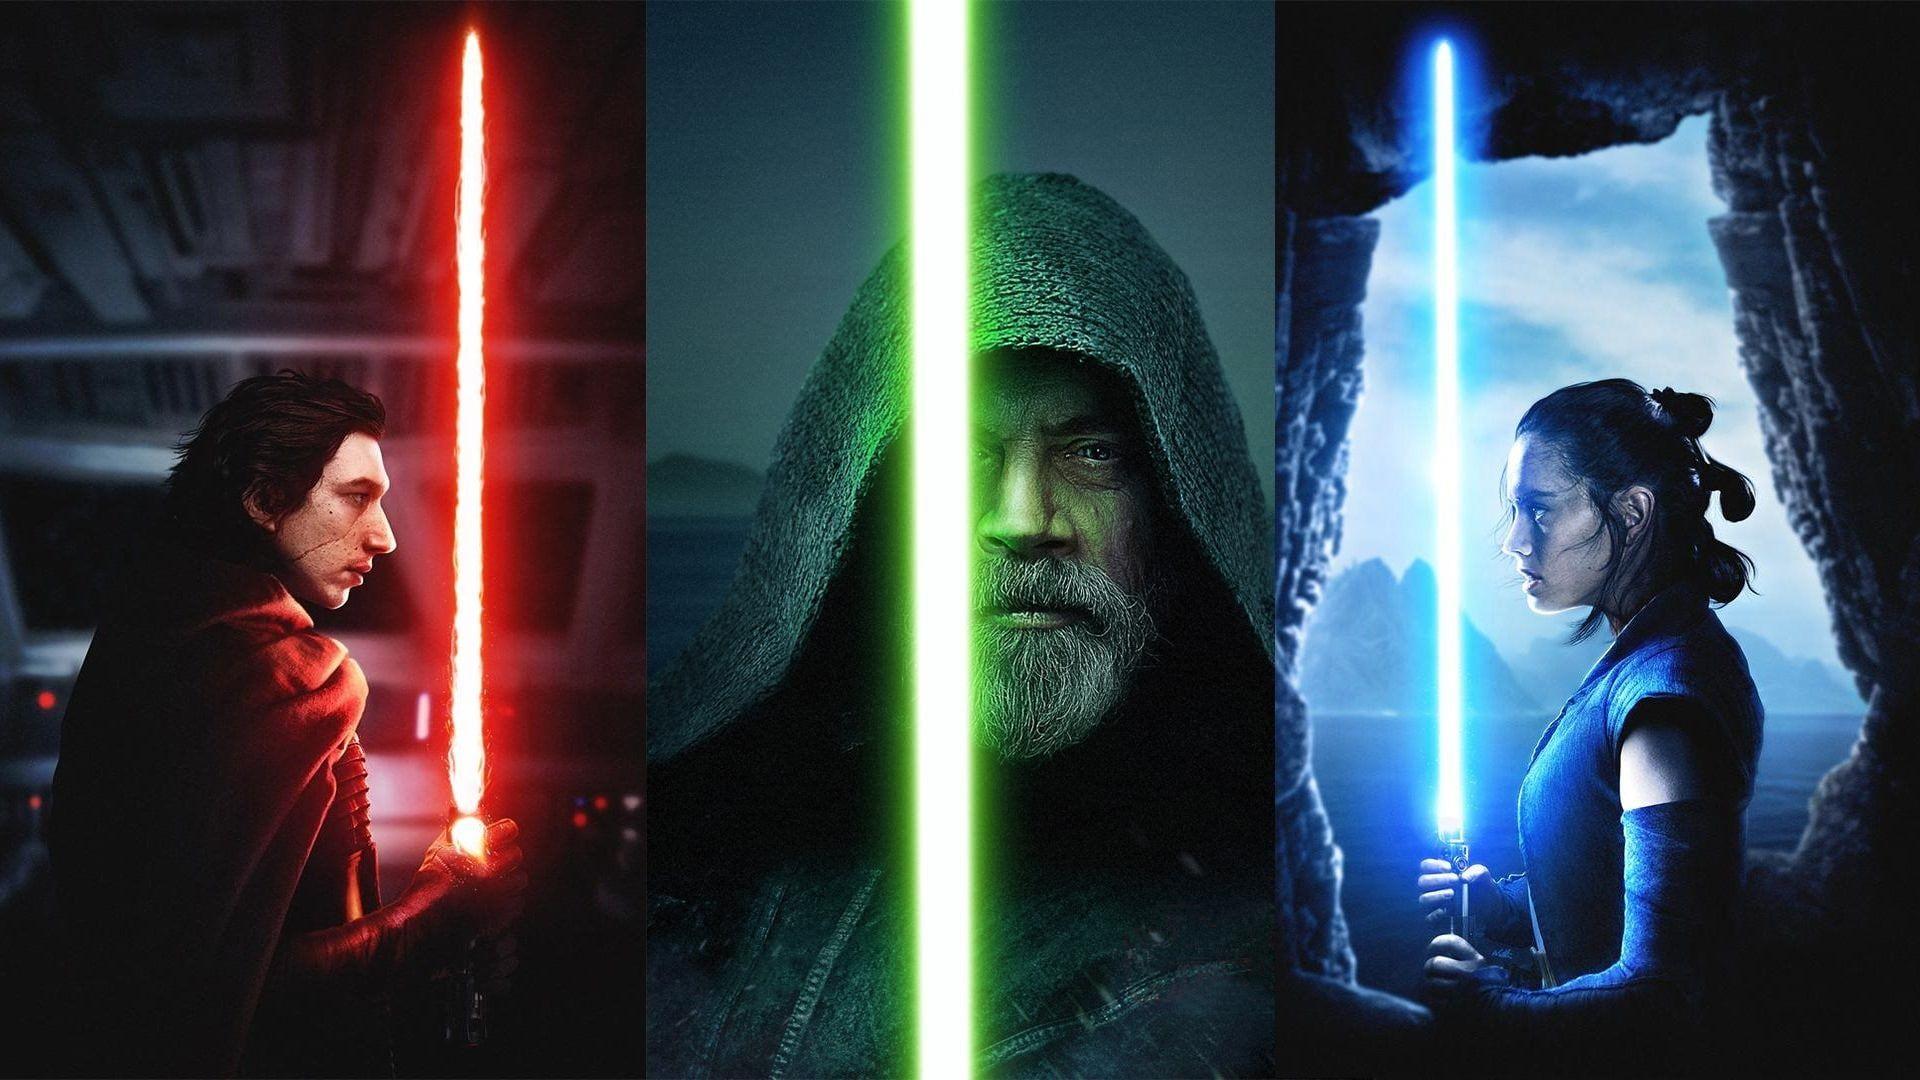 Star Wars Star Wars The Last Jedi Adam Driver Blue Lightsaber Daisy Ridley Girl Green Li In 2020 Star Wars Poster Star Wars Characters Star Wars Characters Wallpaper